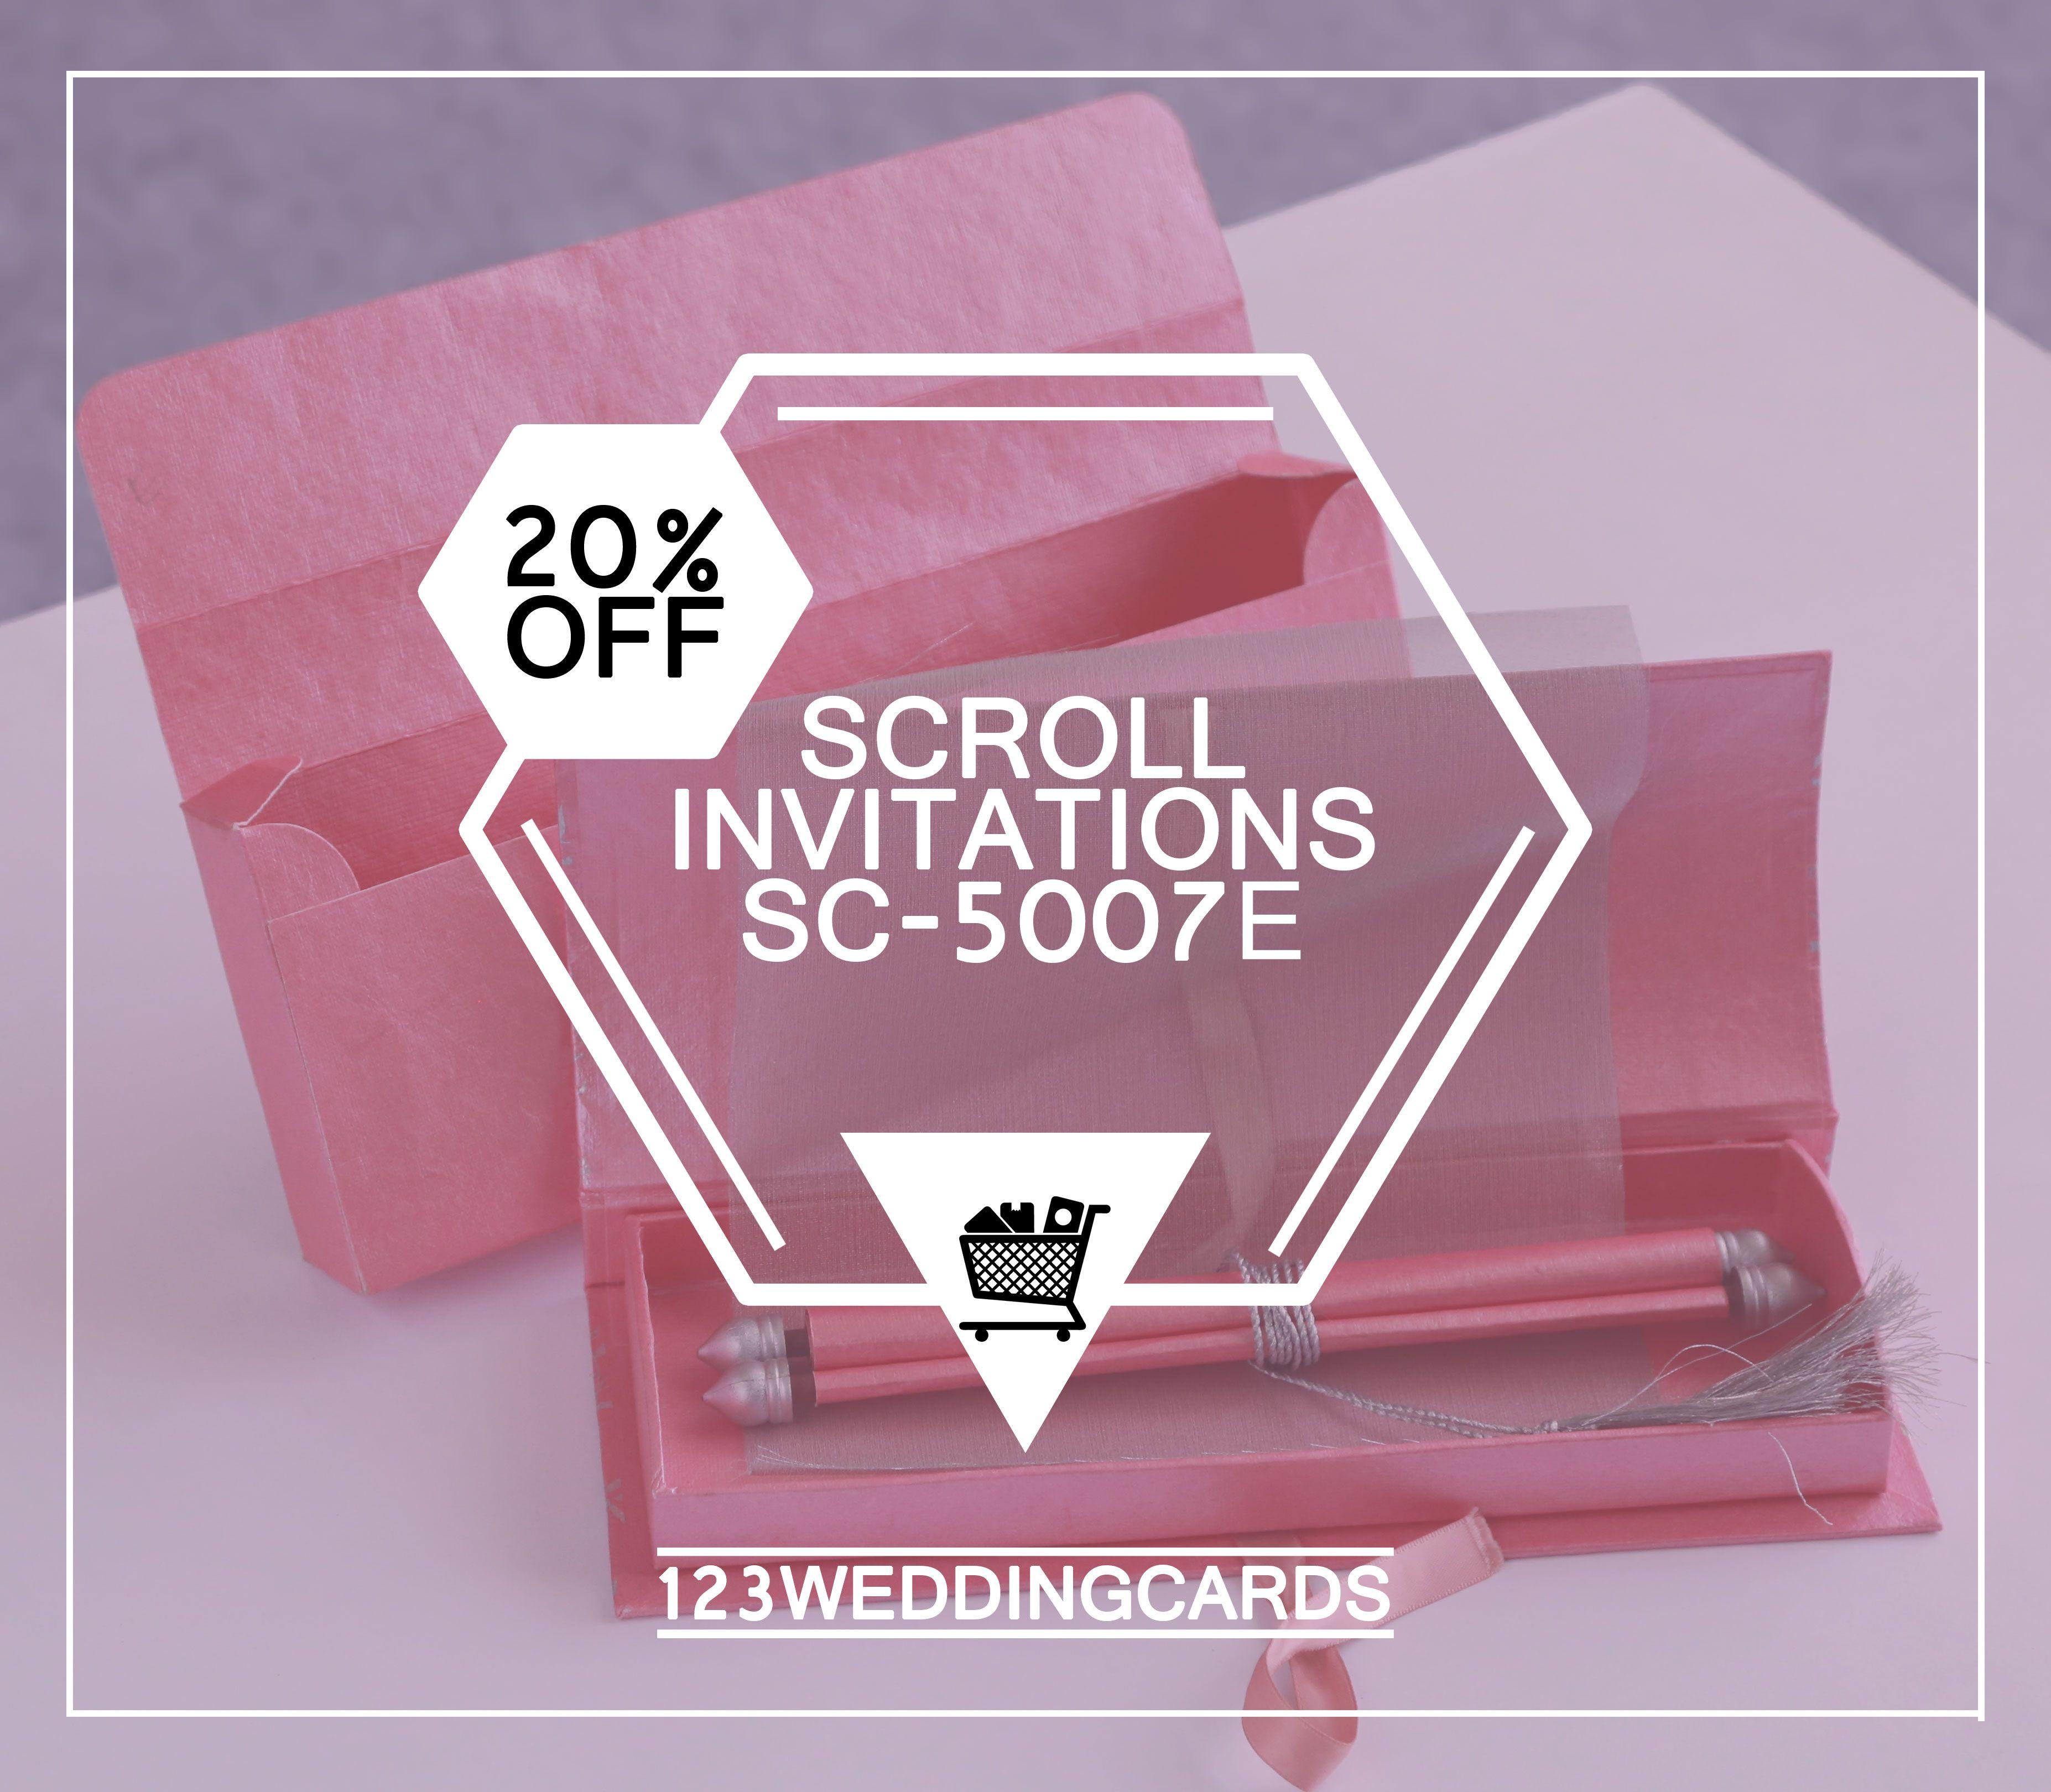 Wedding Venues Near Me Cheap: Pink Handmade Shimmer Wedding Invitation : Sc-5007e